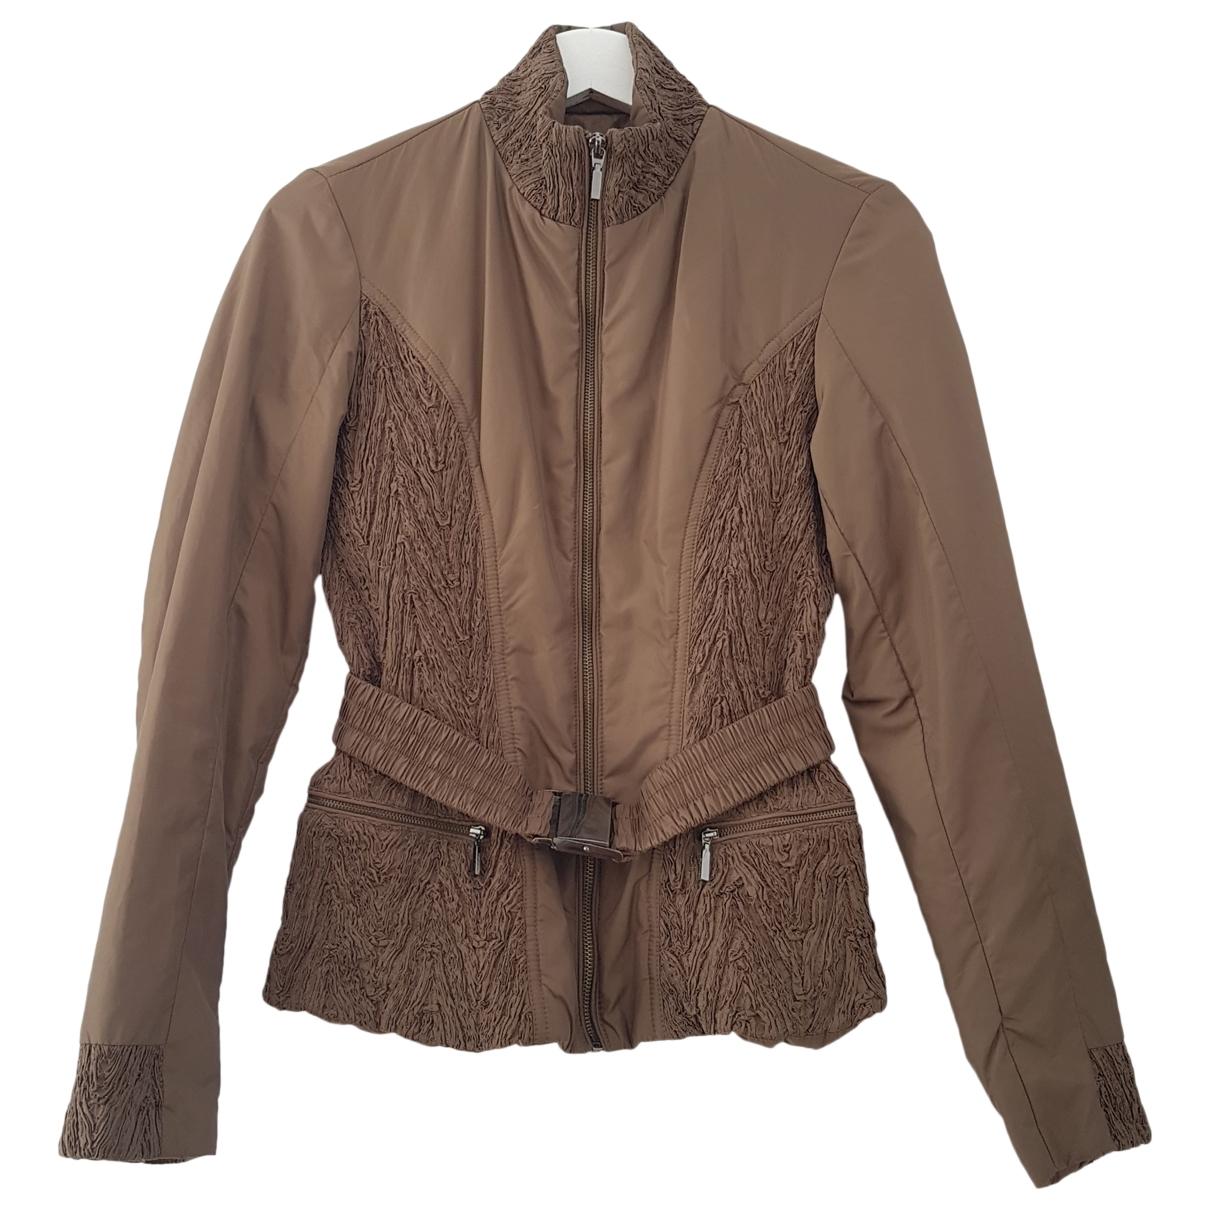 Zara \N Brown jacket for Women S International